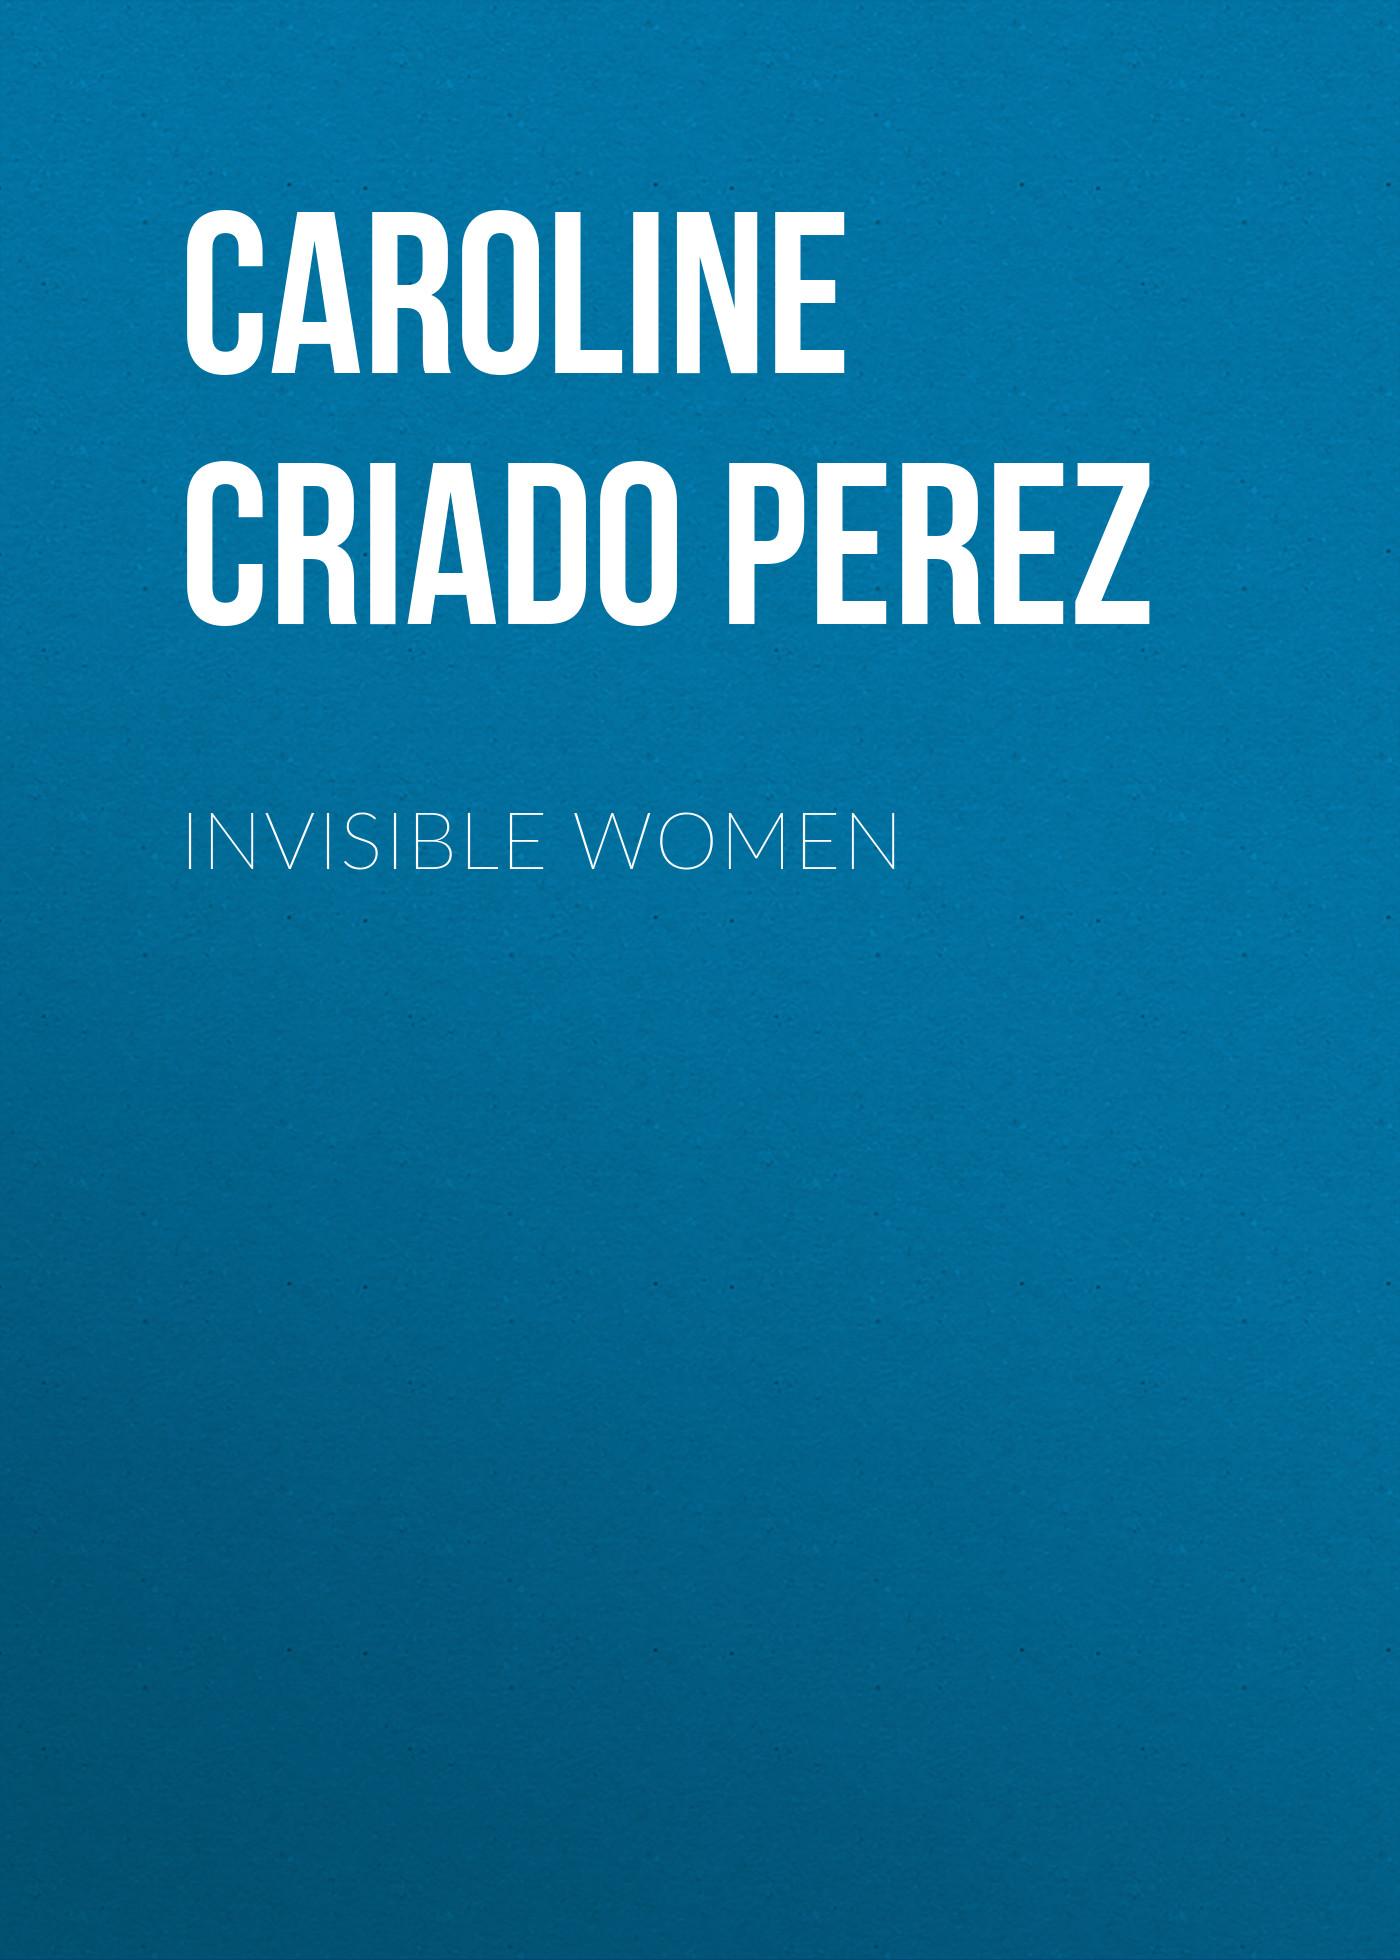 Caroline Criado Perez Invisible Women antonia caroline lant blackout reinventing women for wartime british cinema